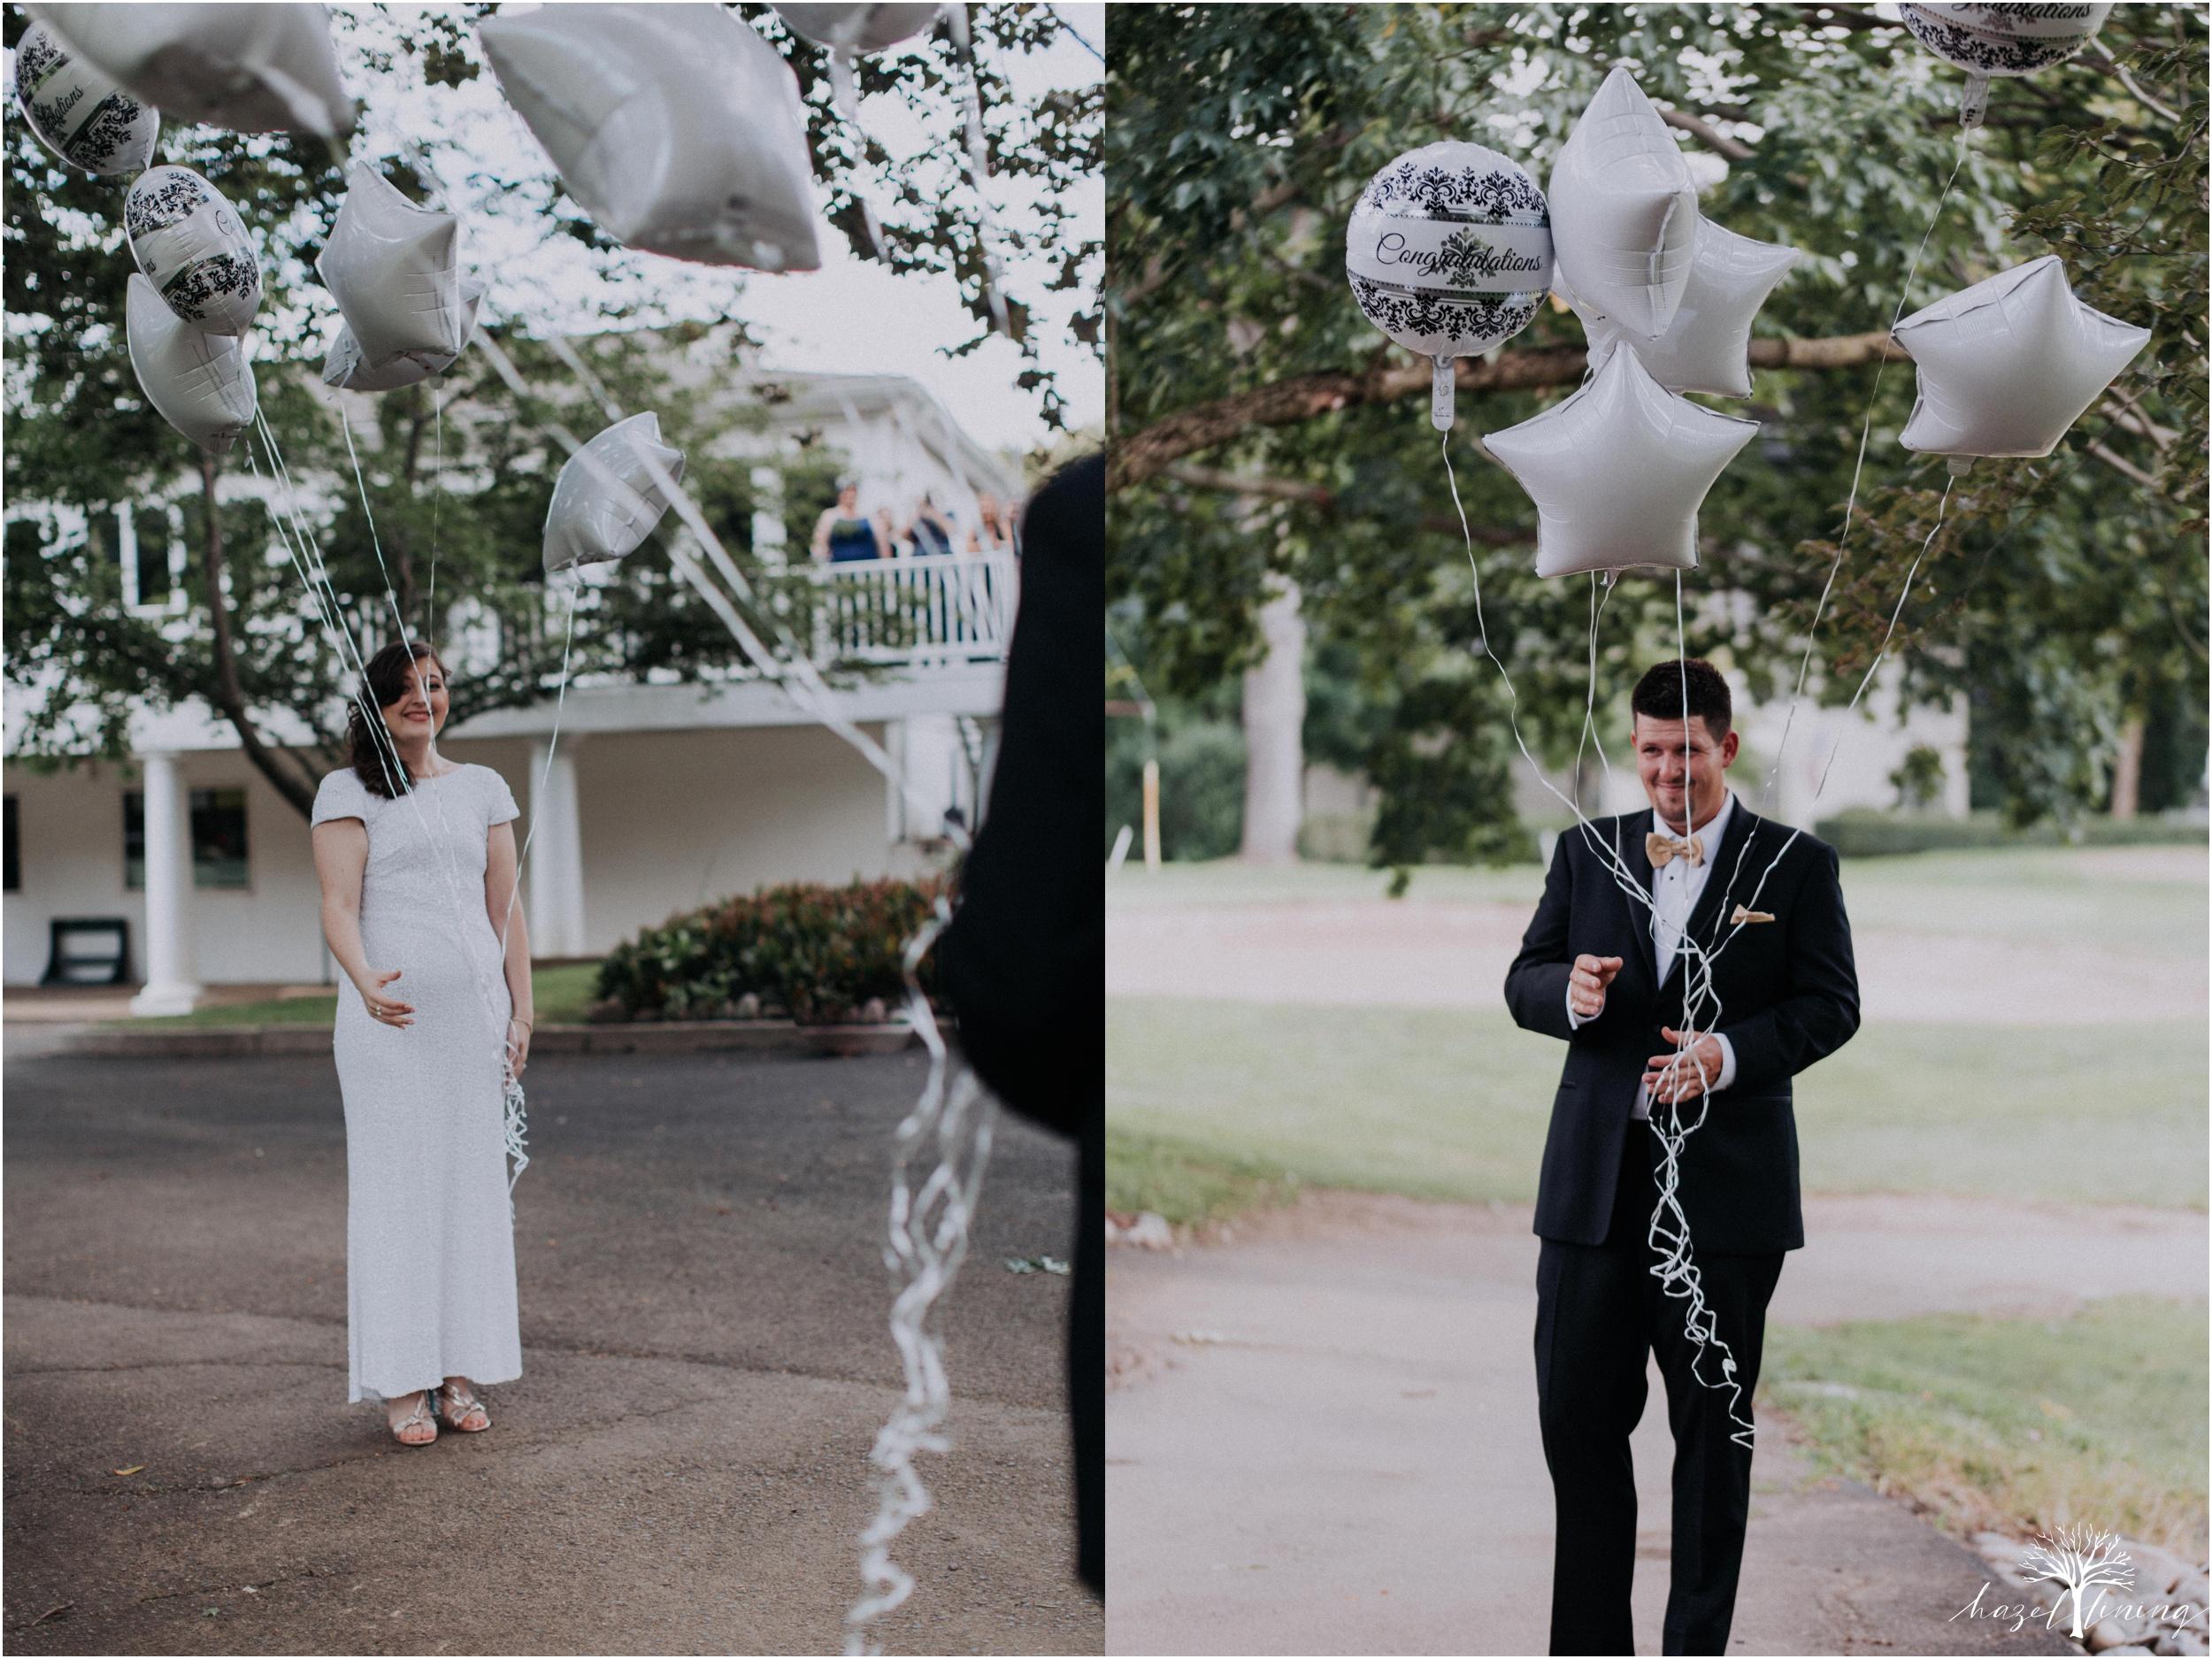 elizabeth-doelp-andrew-foreback-middletown-country-club-summer-langhorne-pennsylvania-wedding-hazel-lining-travel-wedding-elopement-photography_0029.jpg